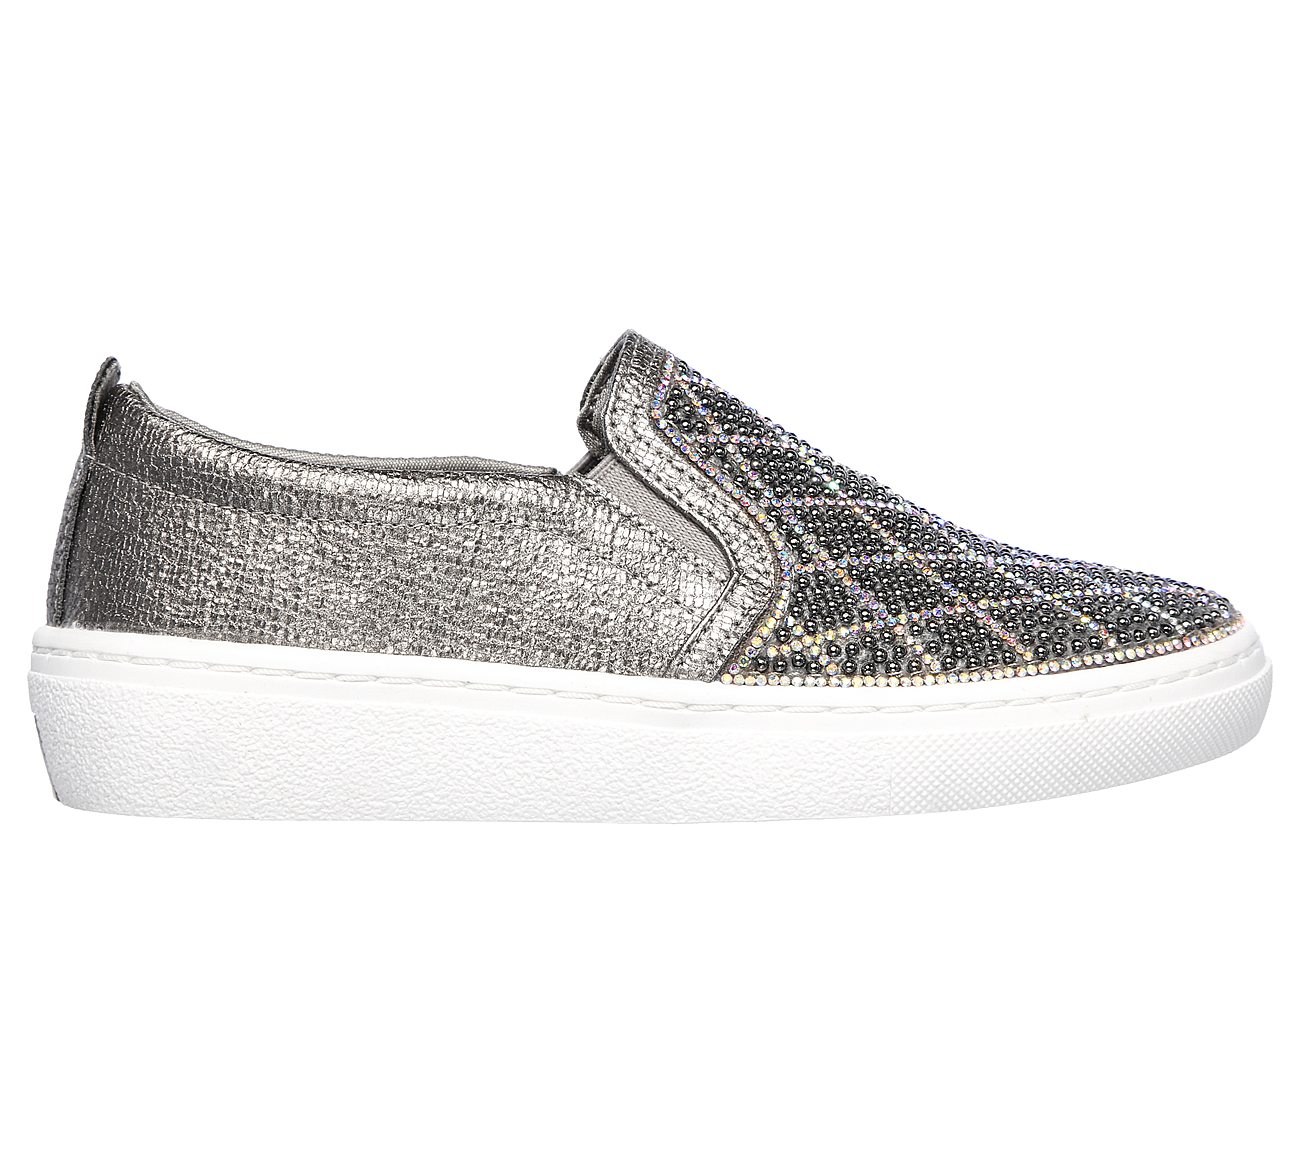 Diamond Darling Slip-On Sneakers Shoes